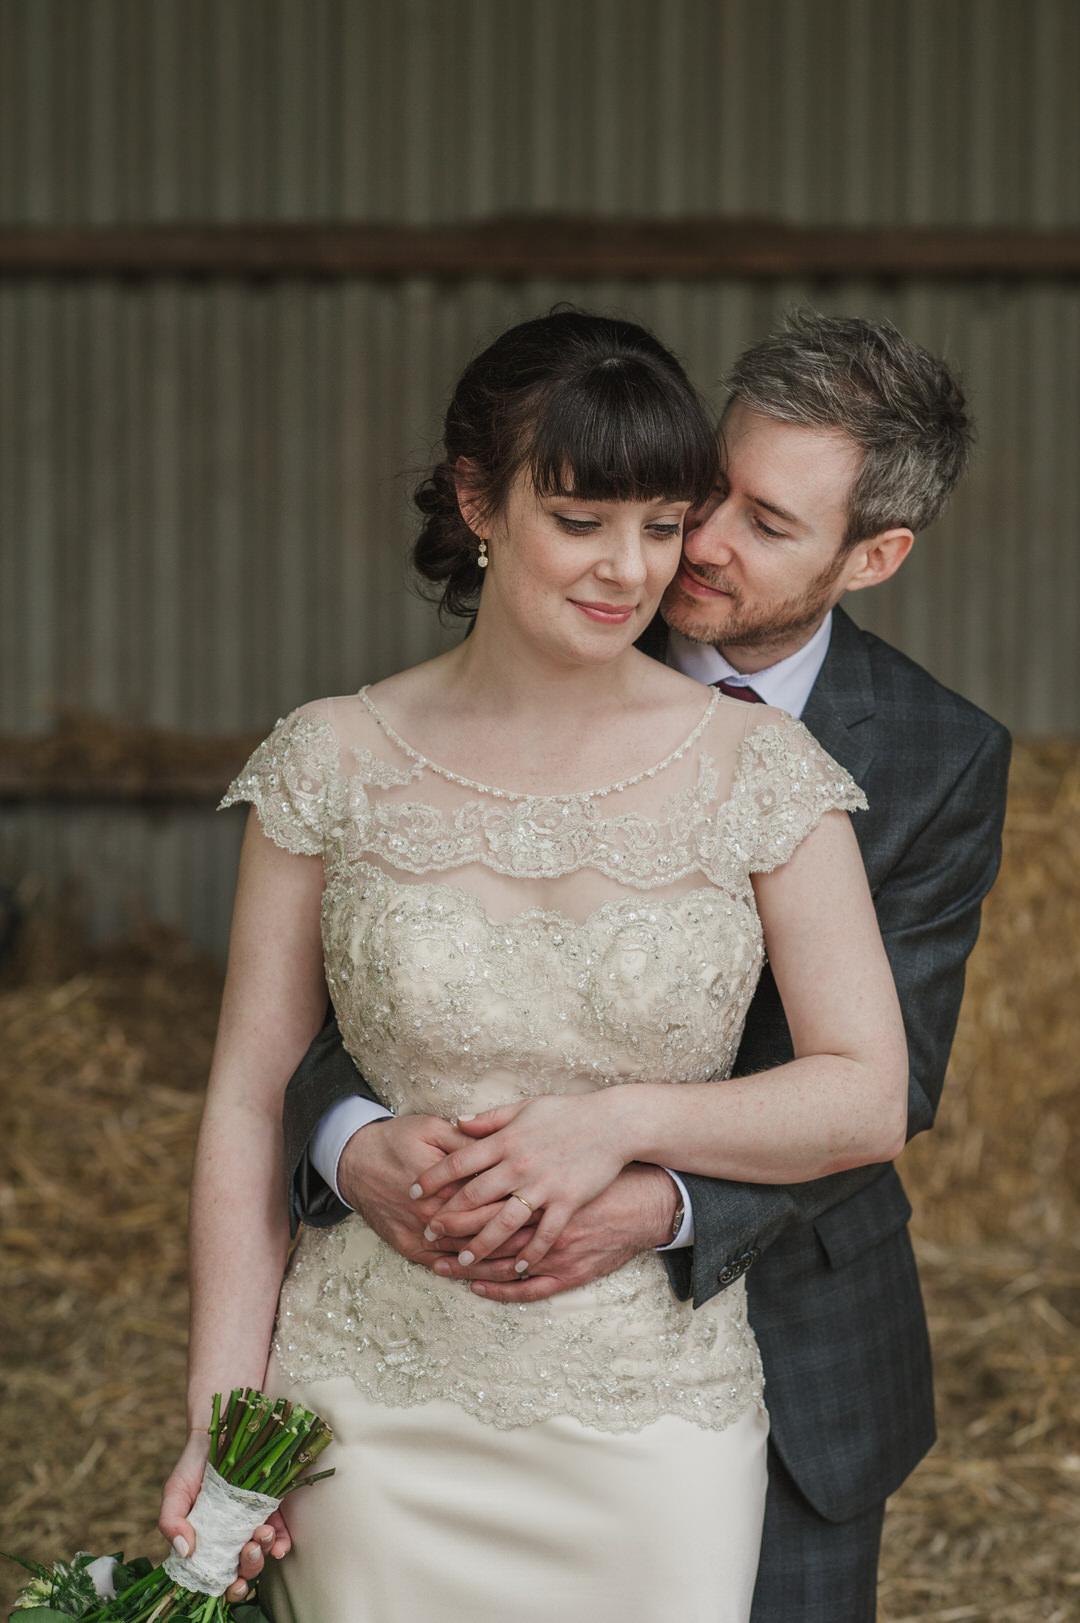 Karen-Flower-Herons-Farm-wedding-1105